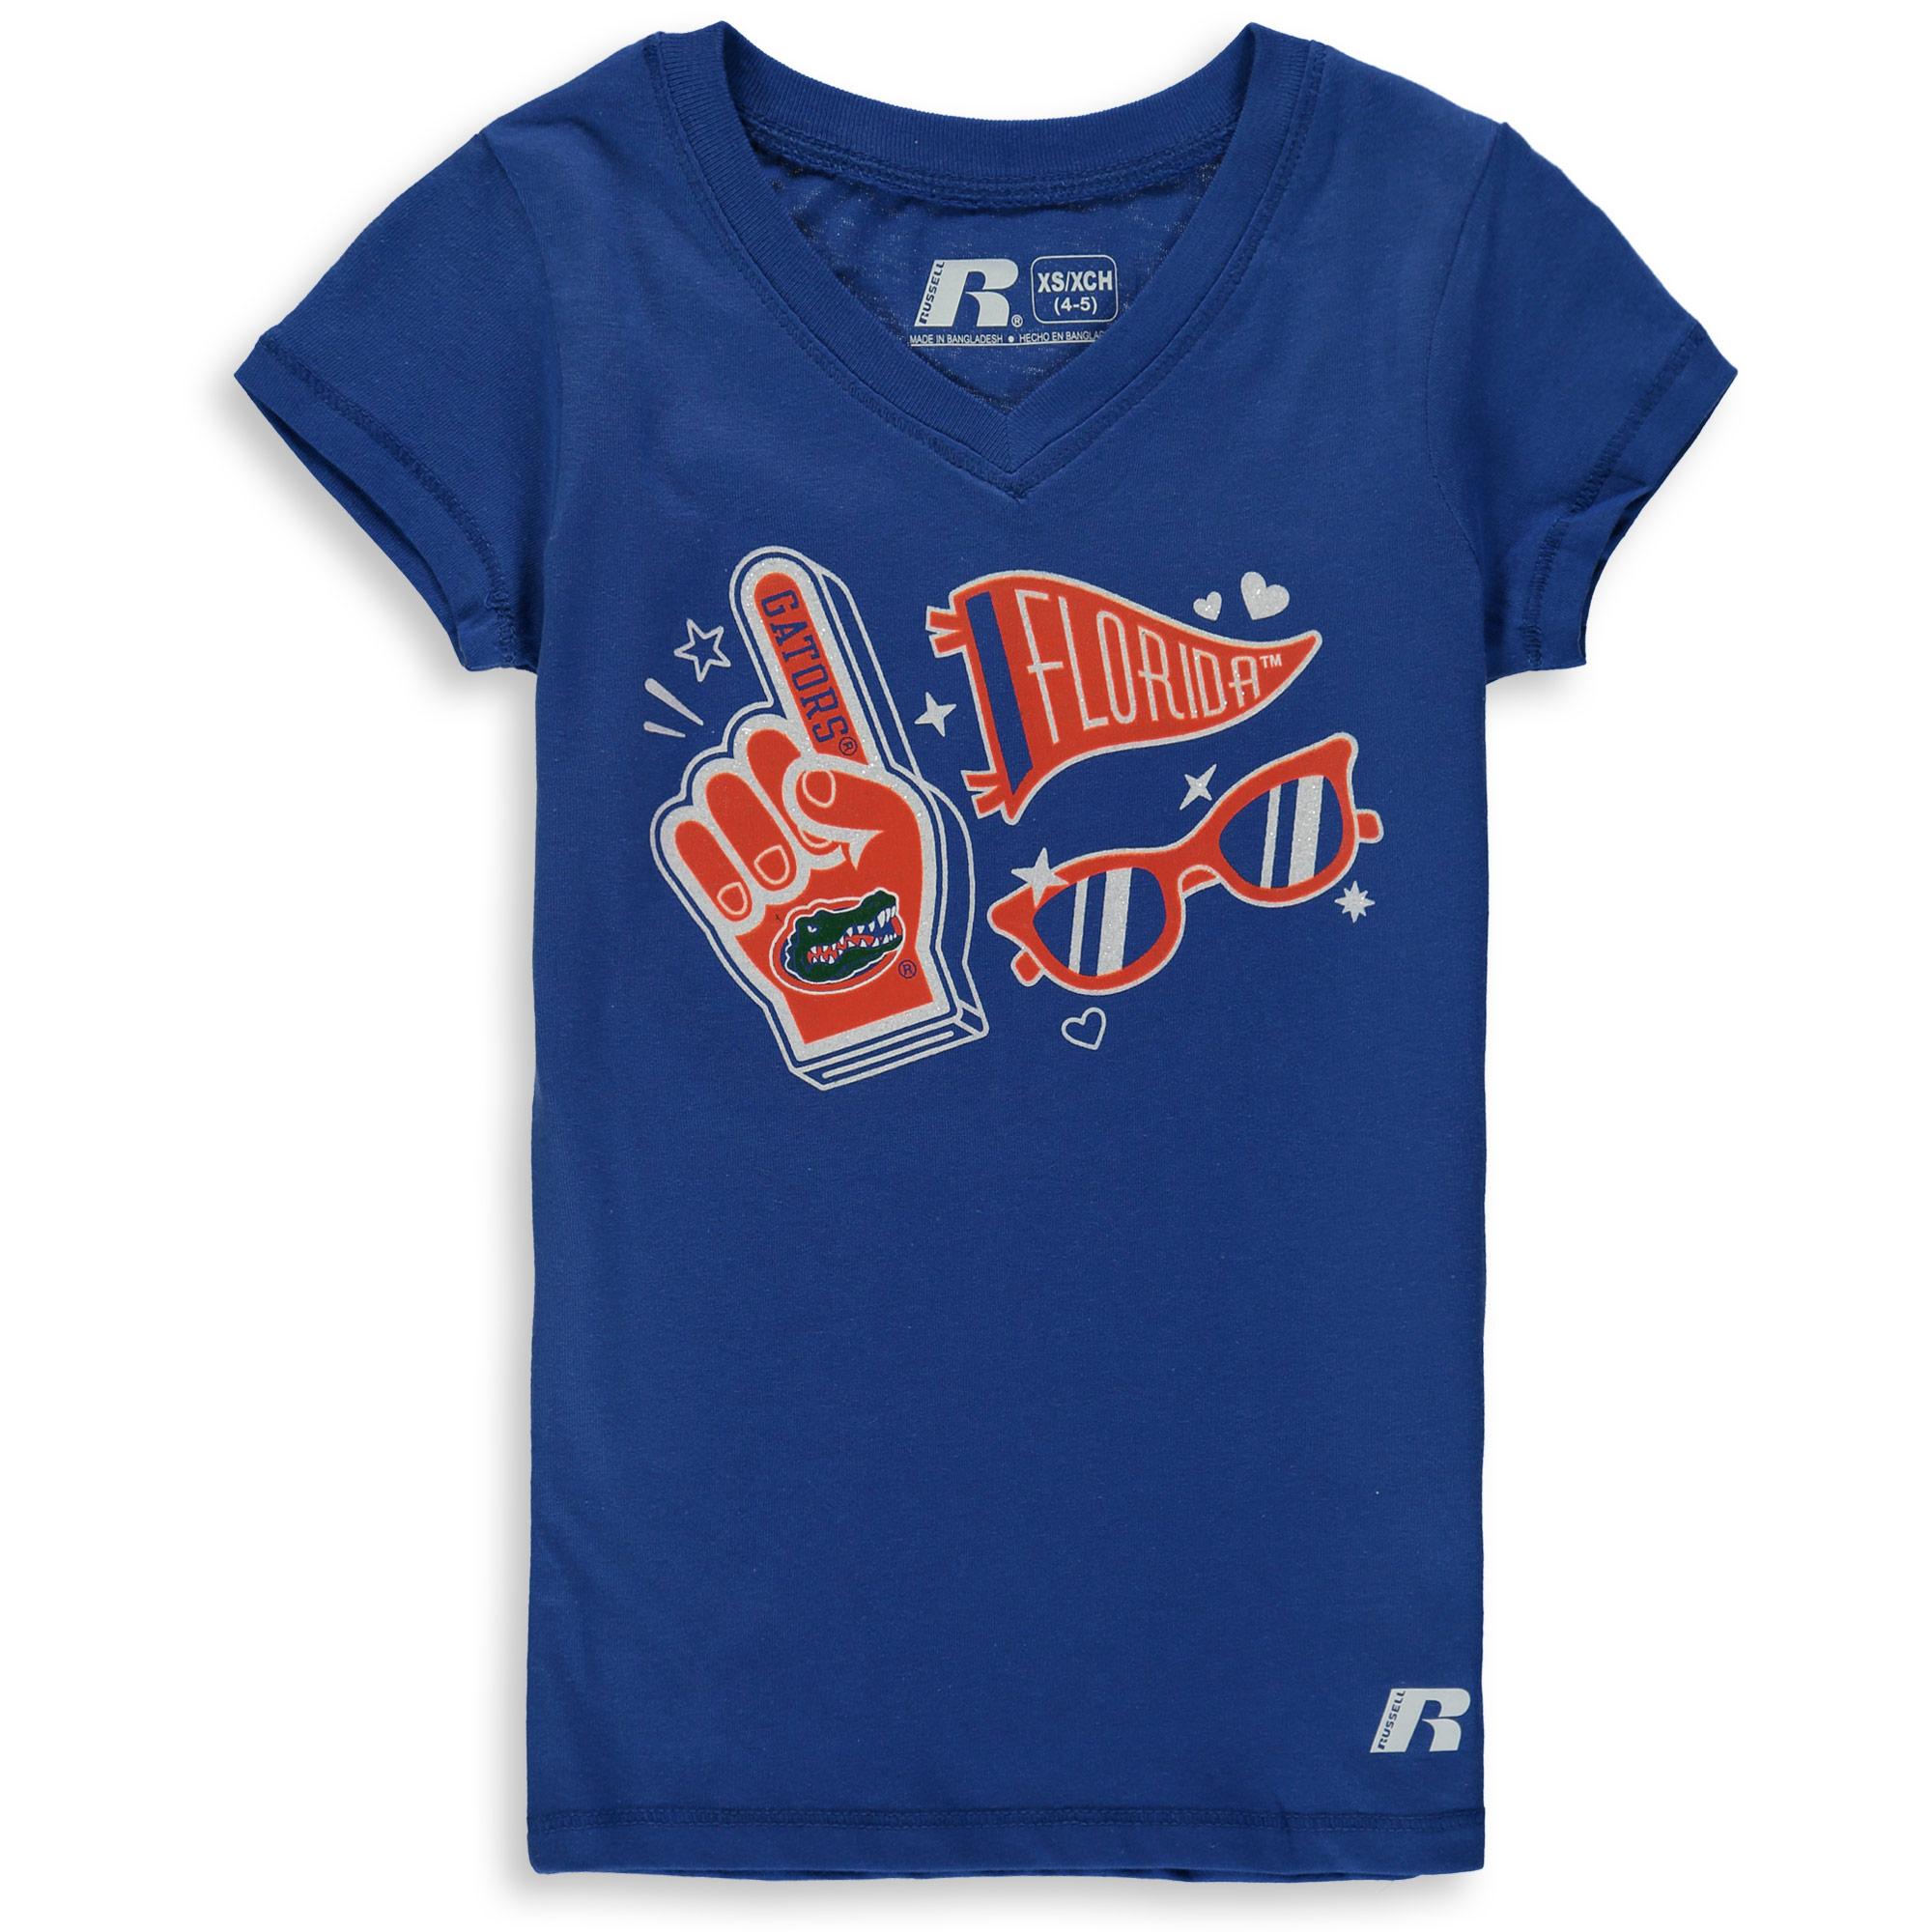 Girls Youth Russell Royal Florida Gators Tunic V-Neck T-Shirt